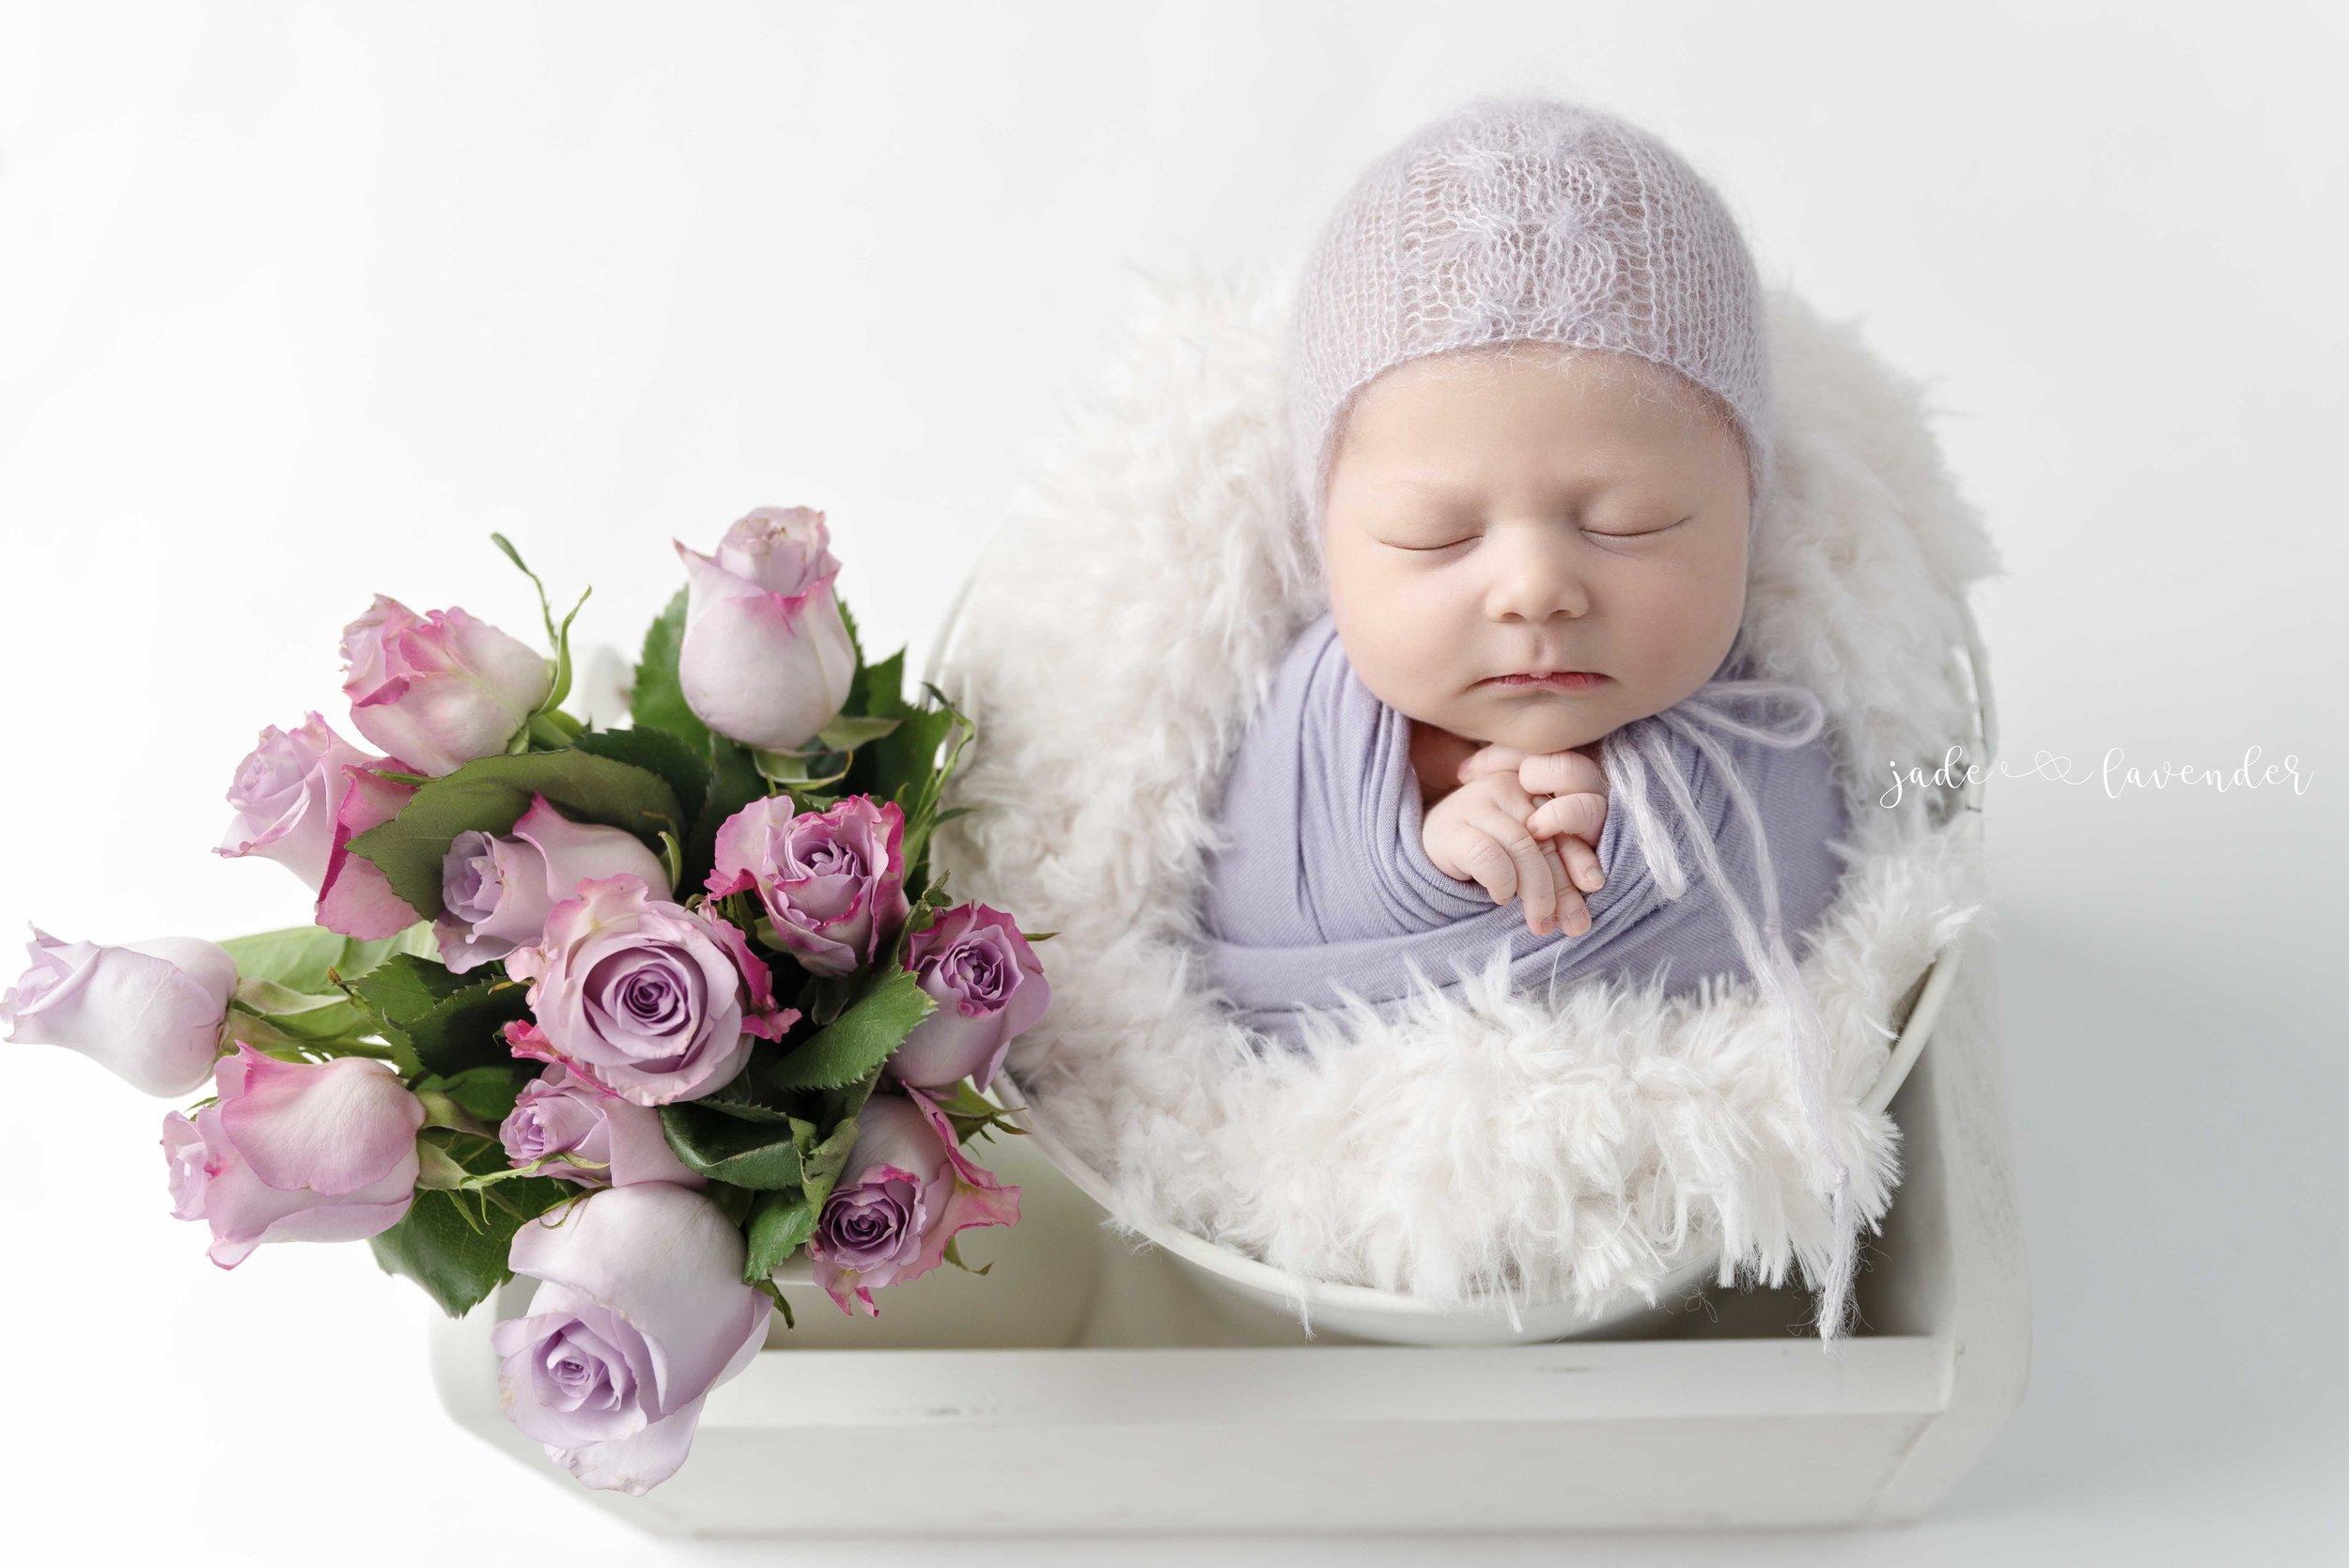 girl-infant-family-photography-baby-photo-studio-newborn-pictures-spokane-washington (7 of 8).jpg